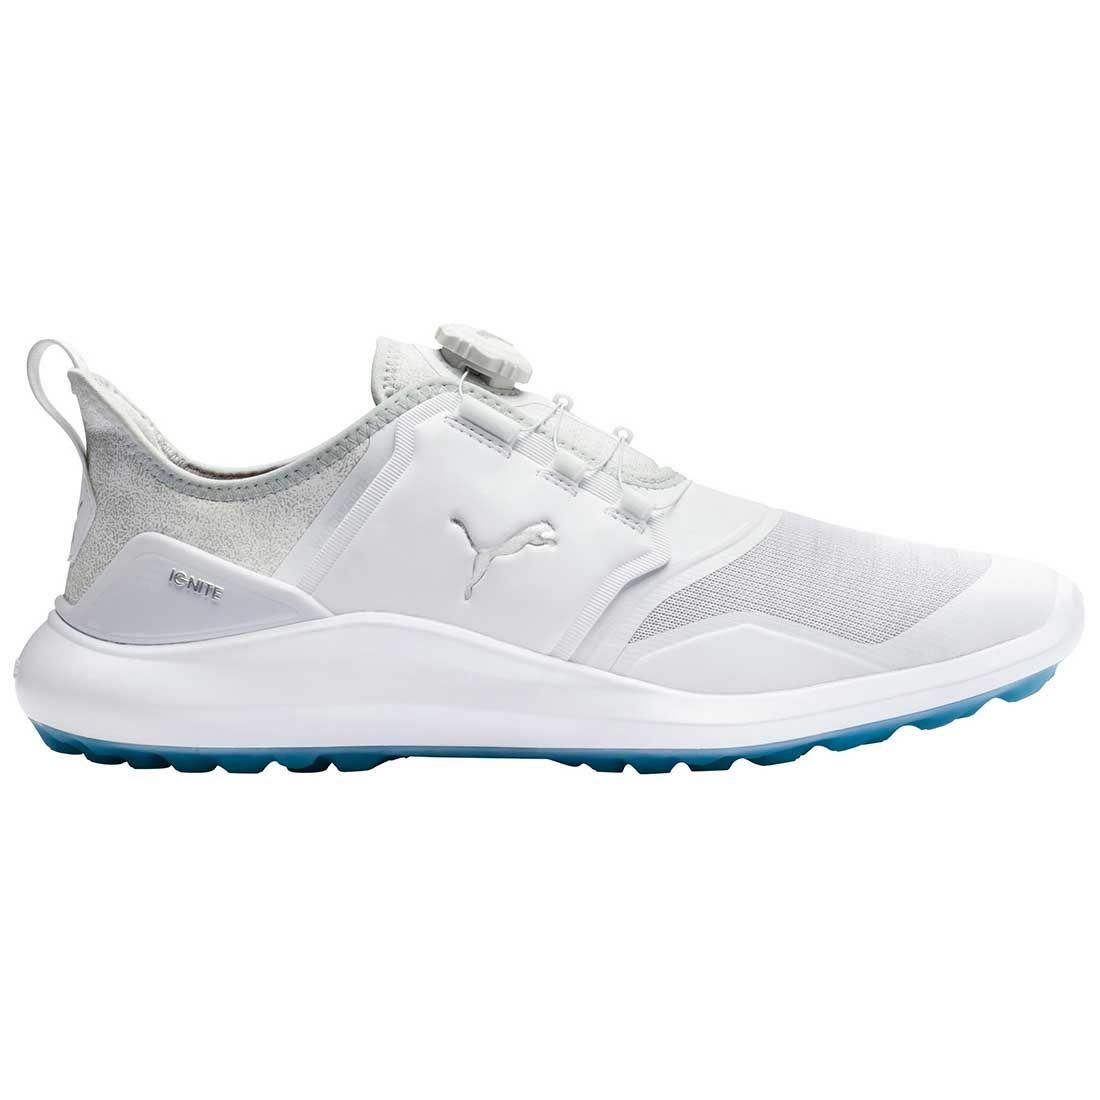 Buy Puma Ignite NXT Disc Golf Shoes